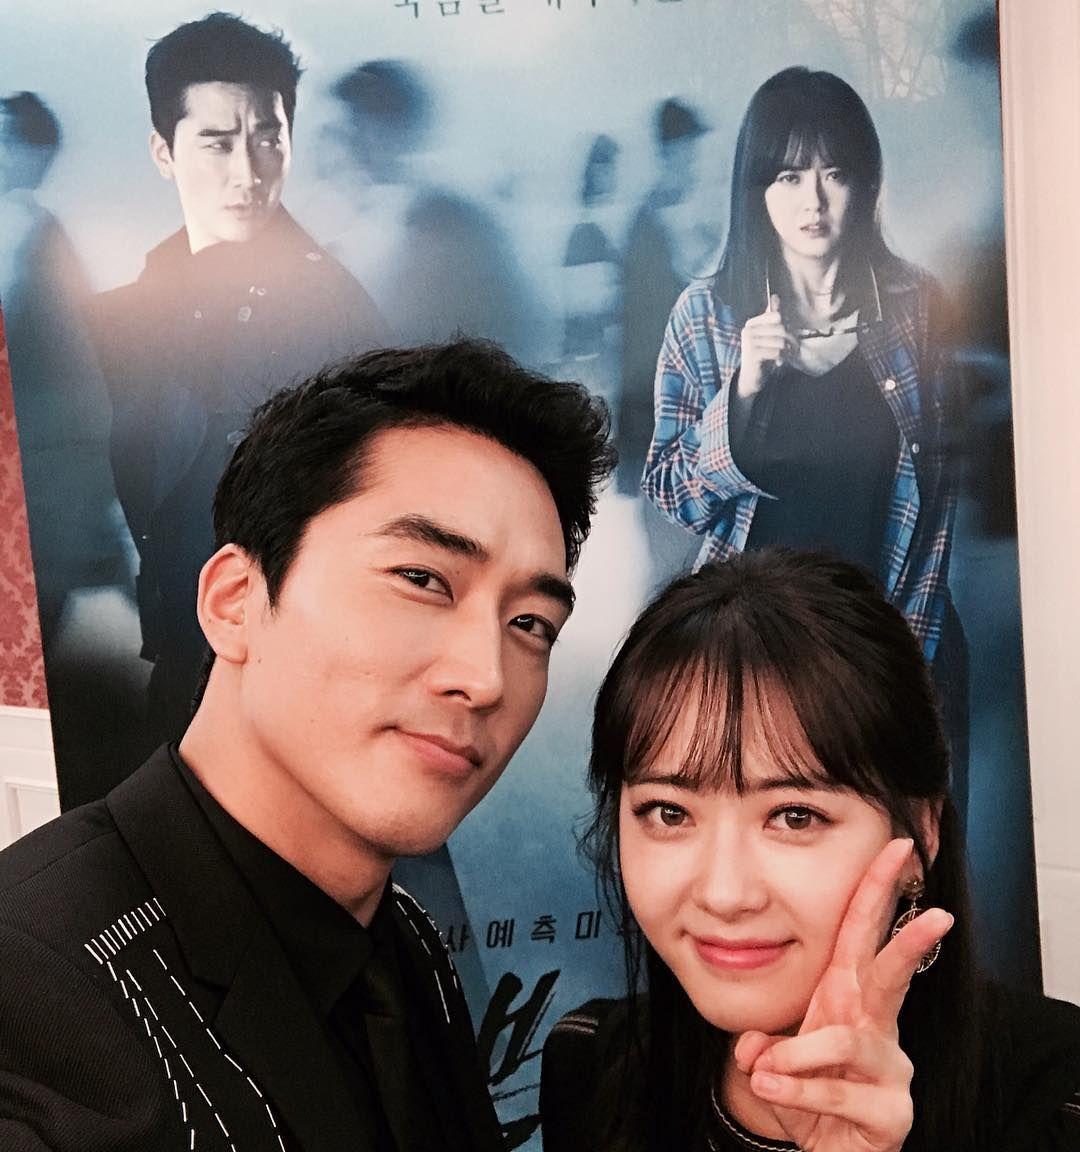 16 7b Begenme 290 Yorum Instagram Da 송승헌 Songseungheon1005 Black D 1 Song Seung Heon Korean Drama Movies Korean Drama